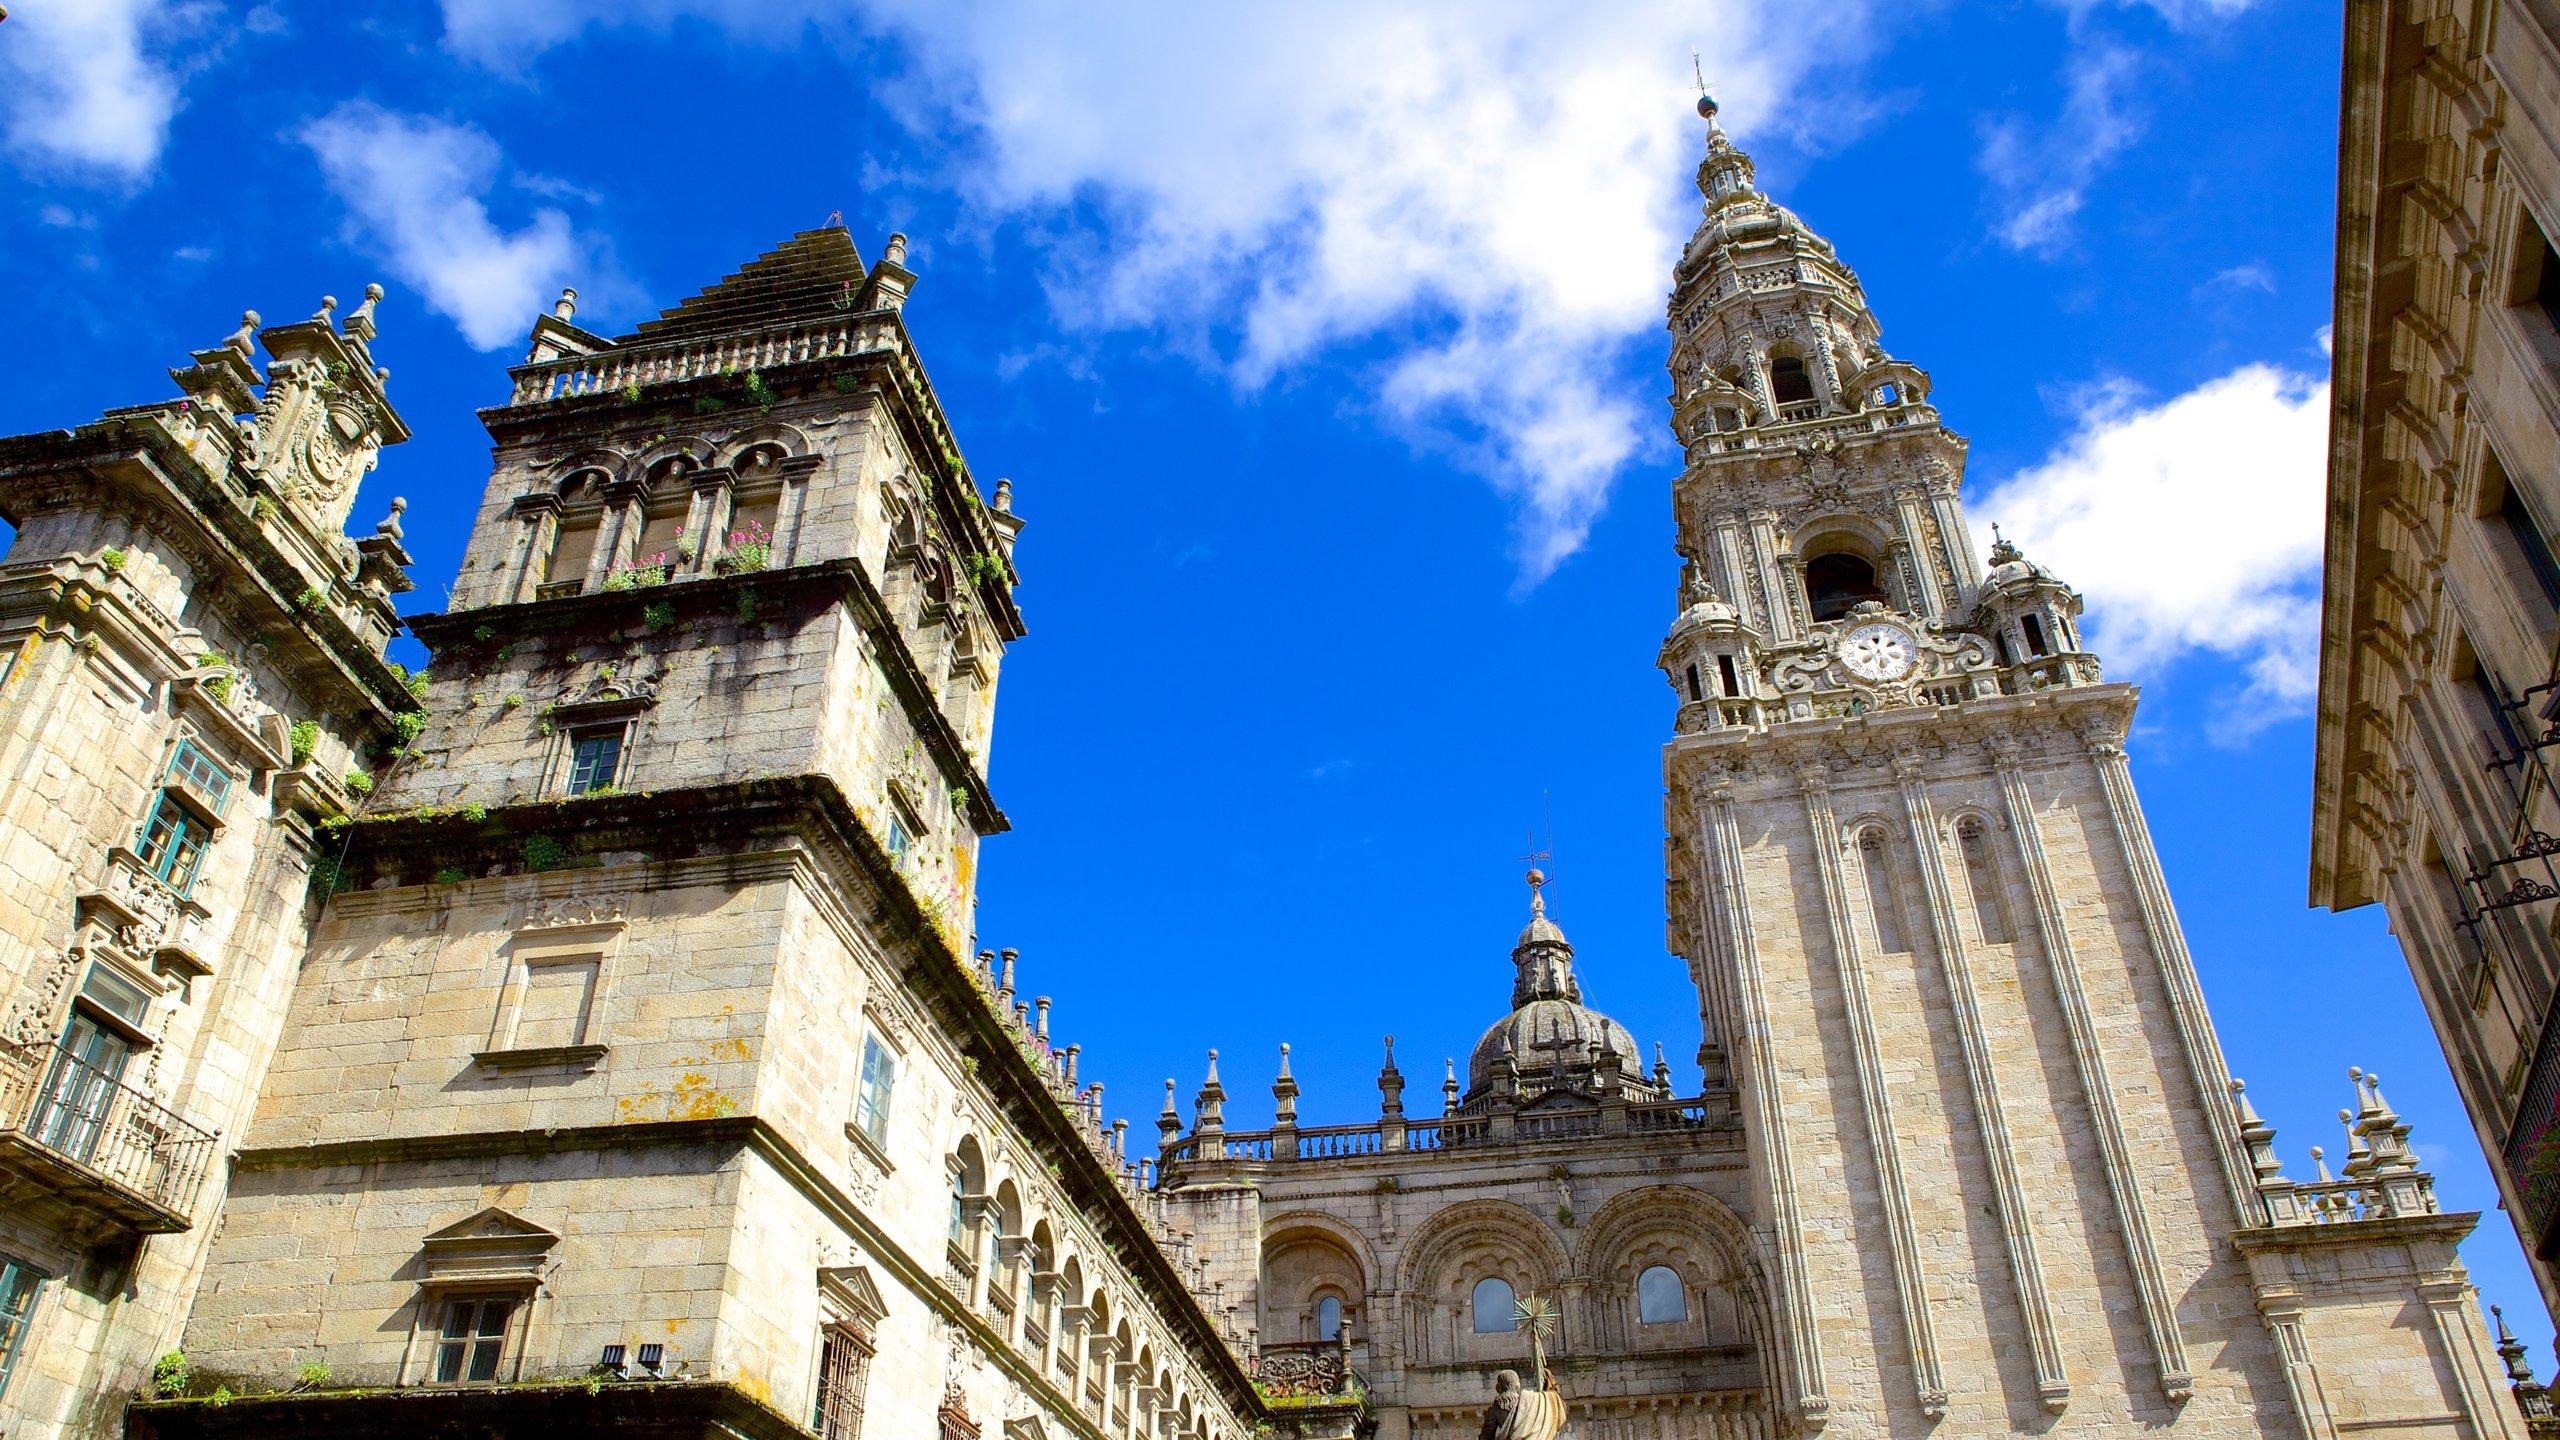 Prowincja A Coruña, Galicja, Hiszpania